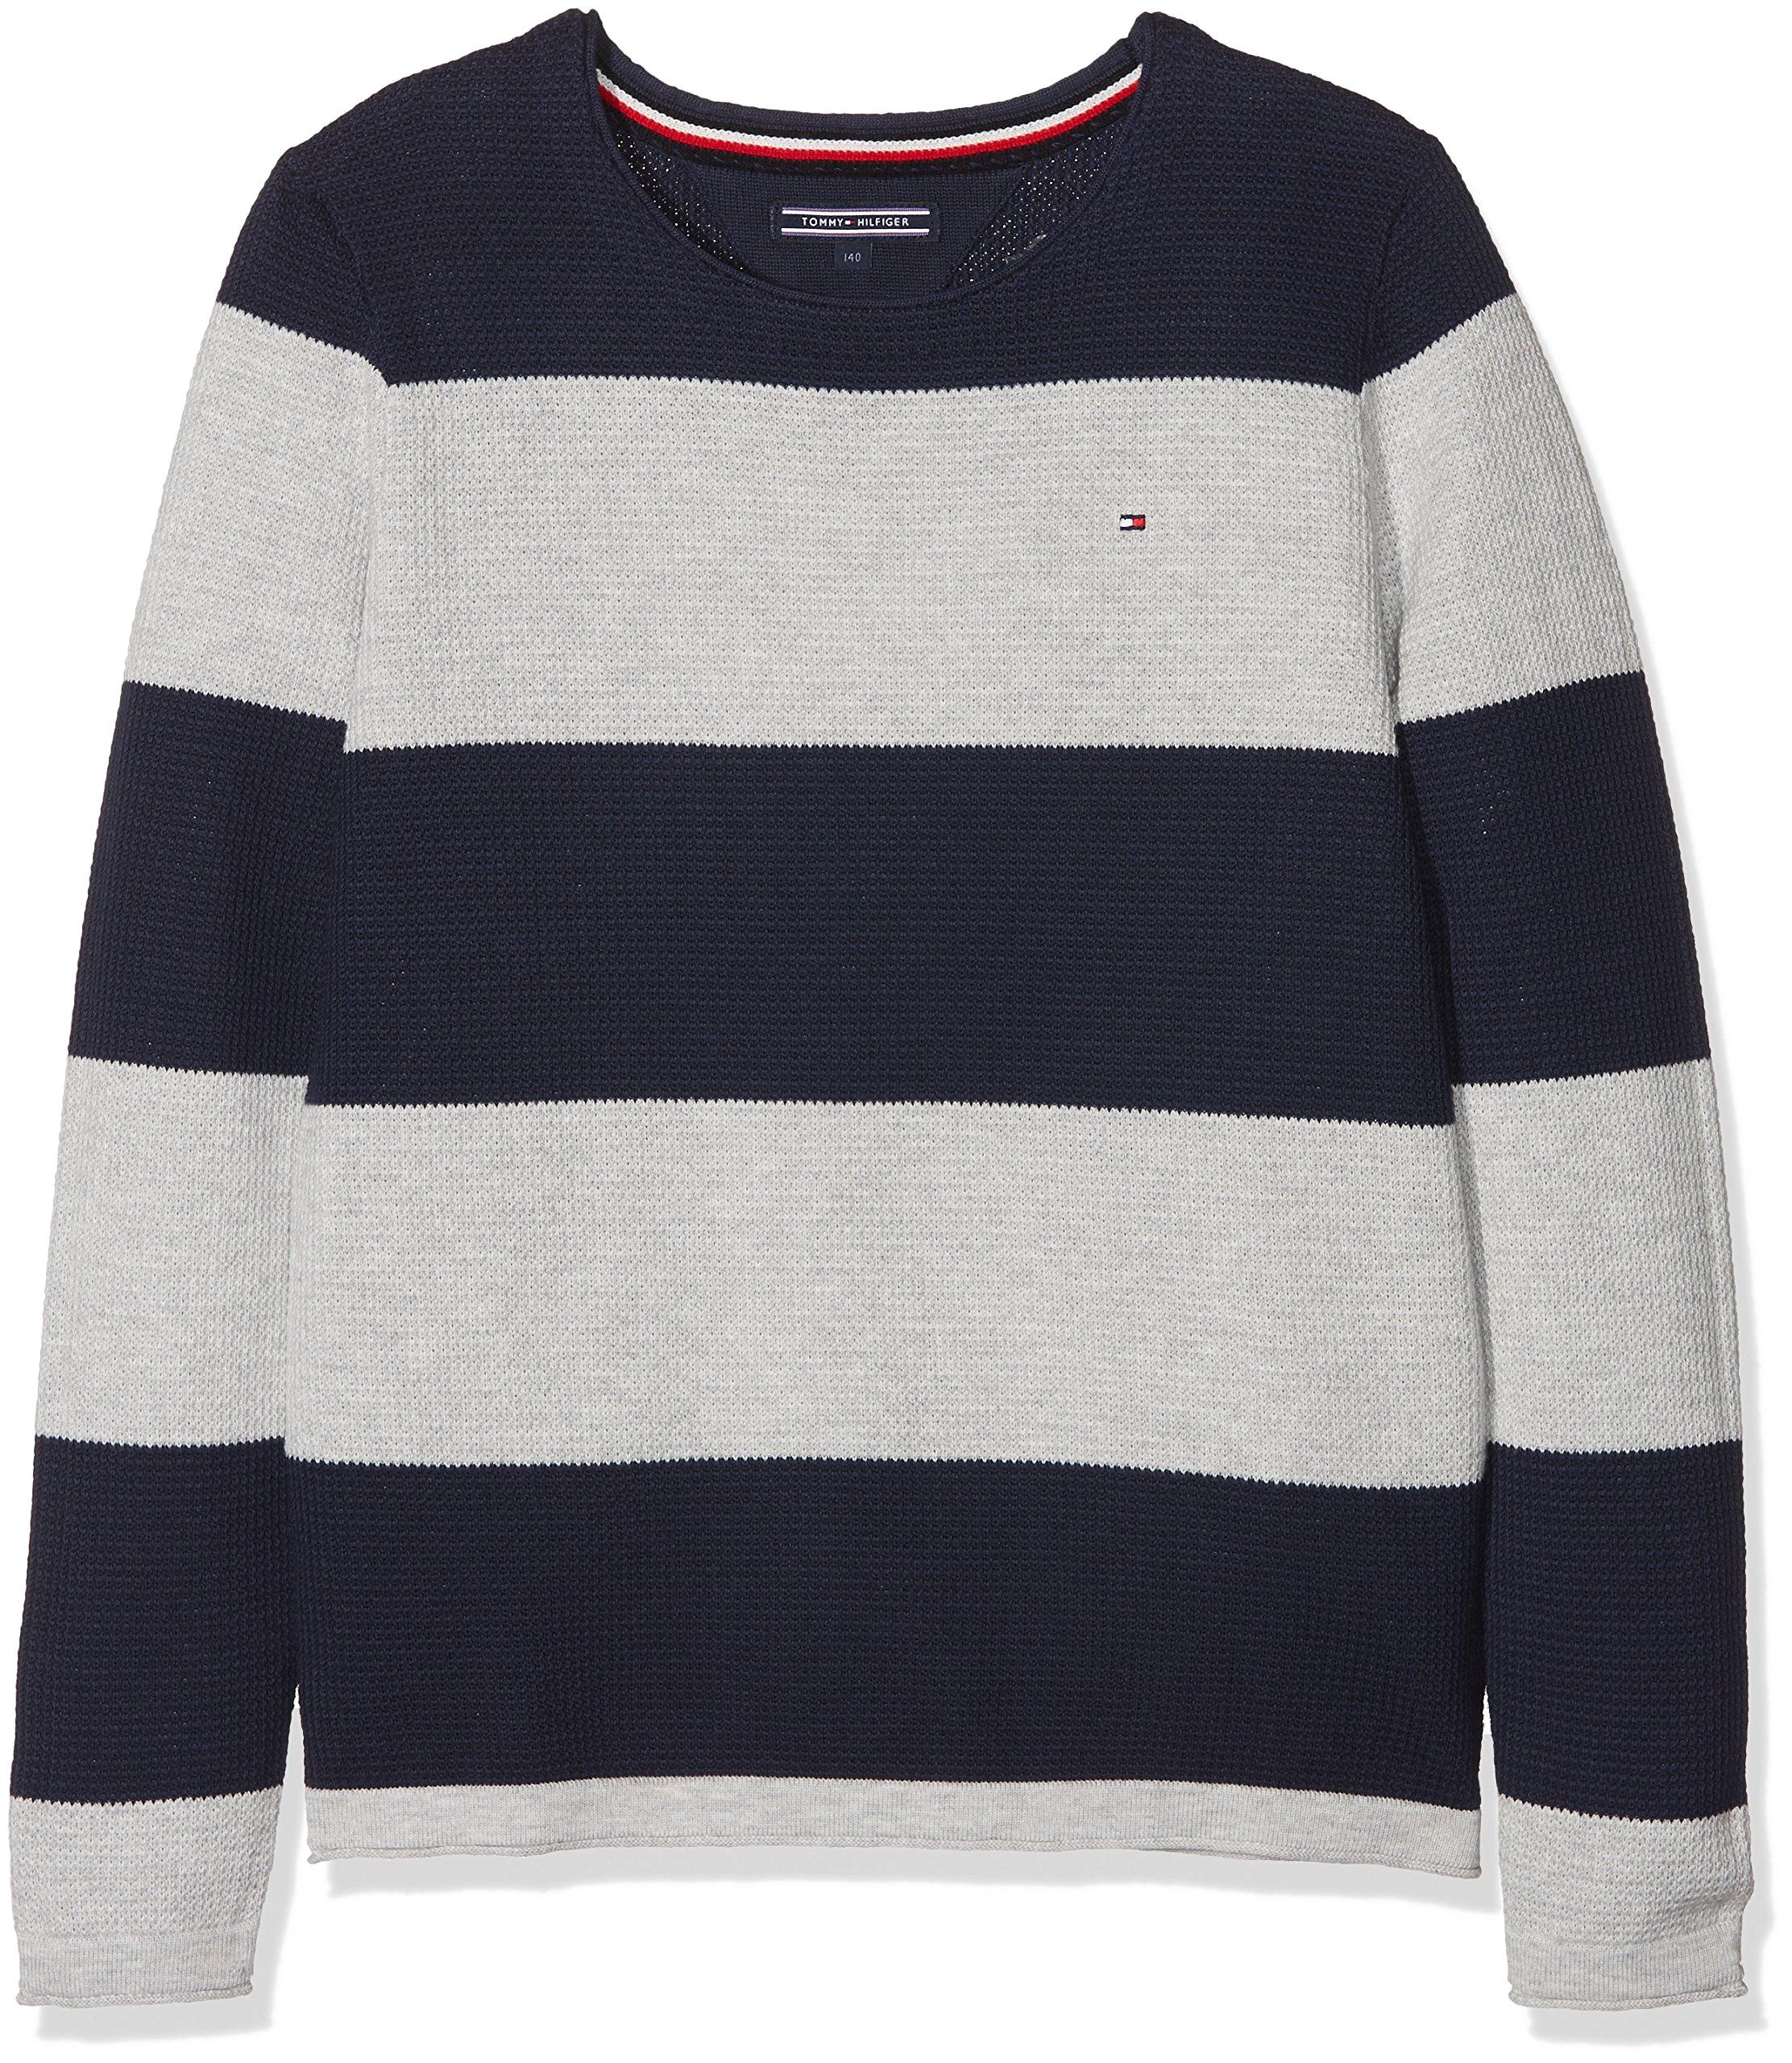 Tommy Hilfiger Boys Basic CN Knit SS Maglietta Bambino SGMStore